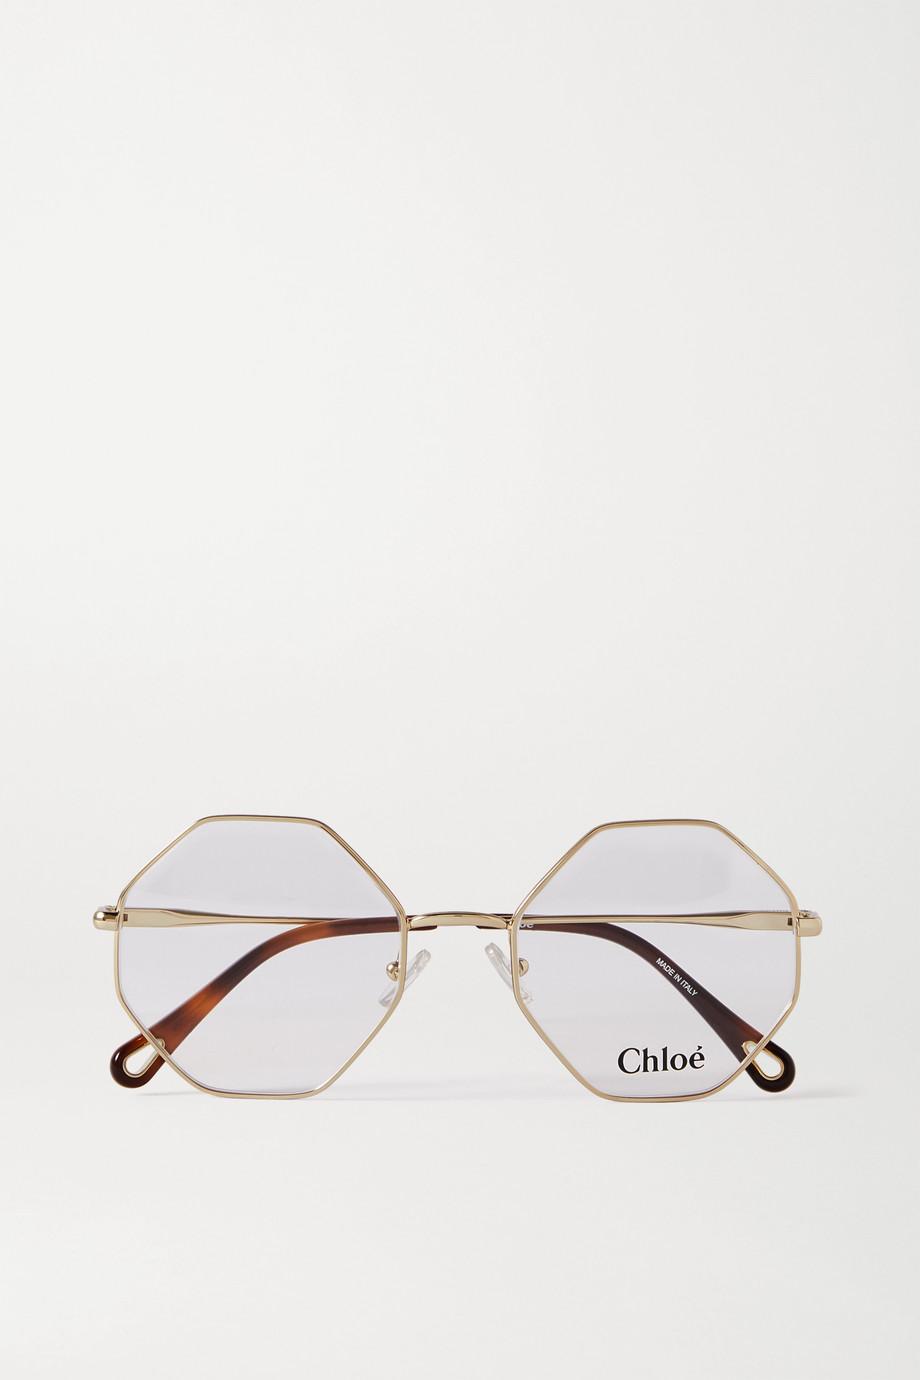 Chloé Octagon-frame gold-tone optical glasses